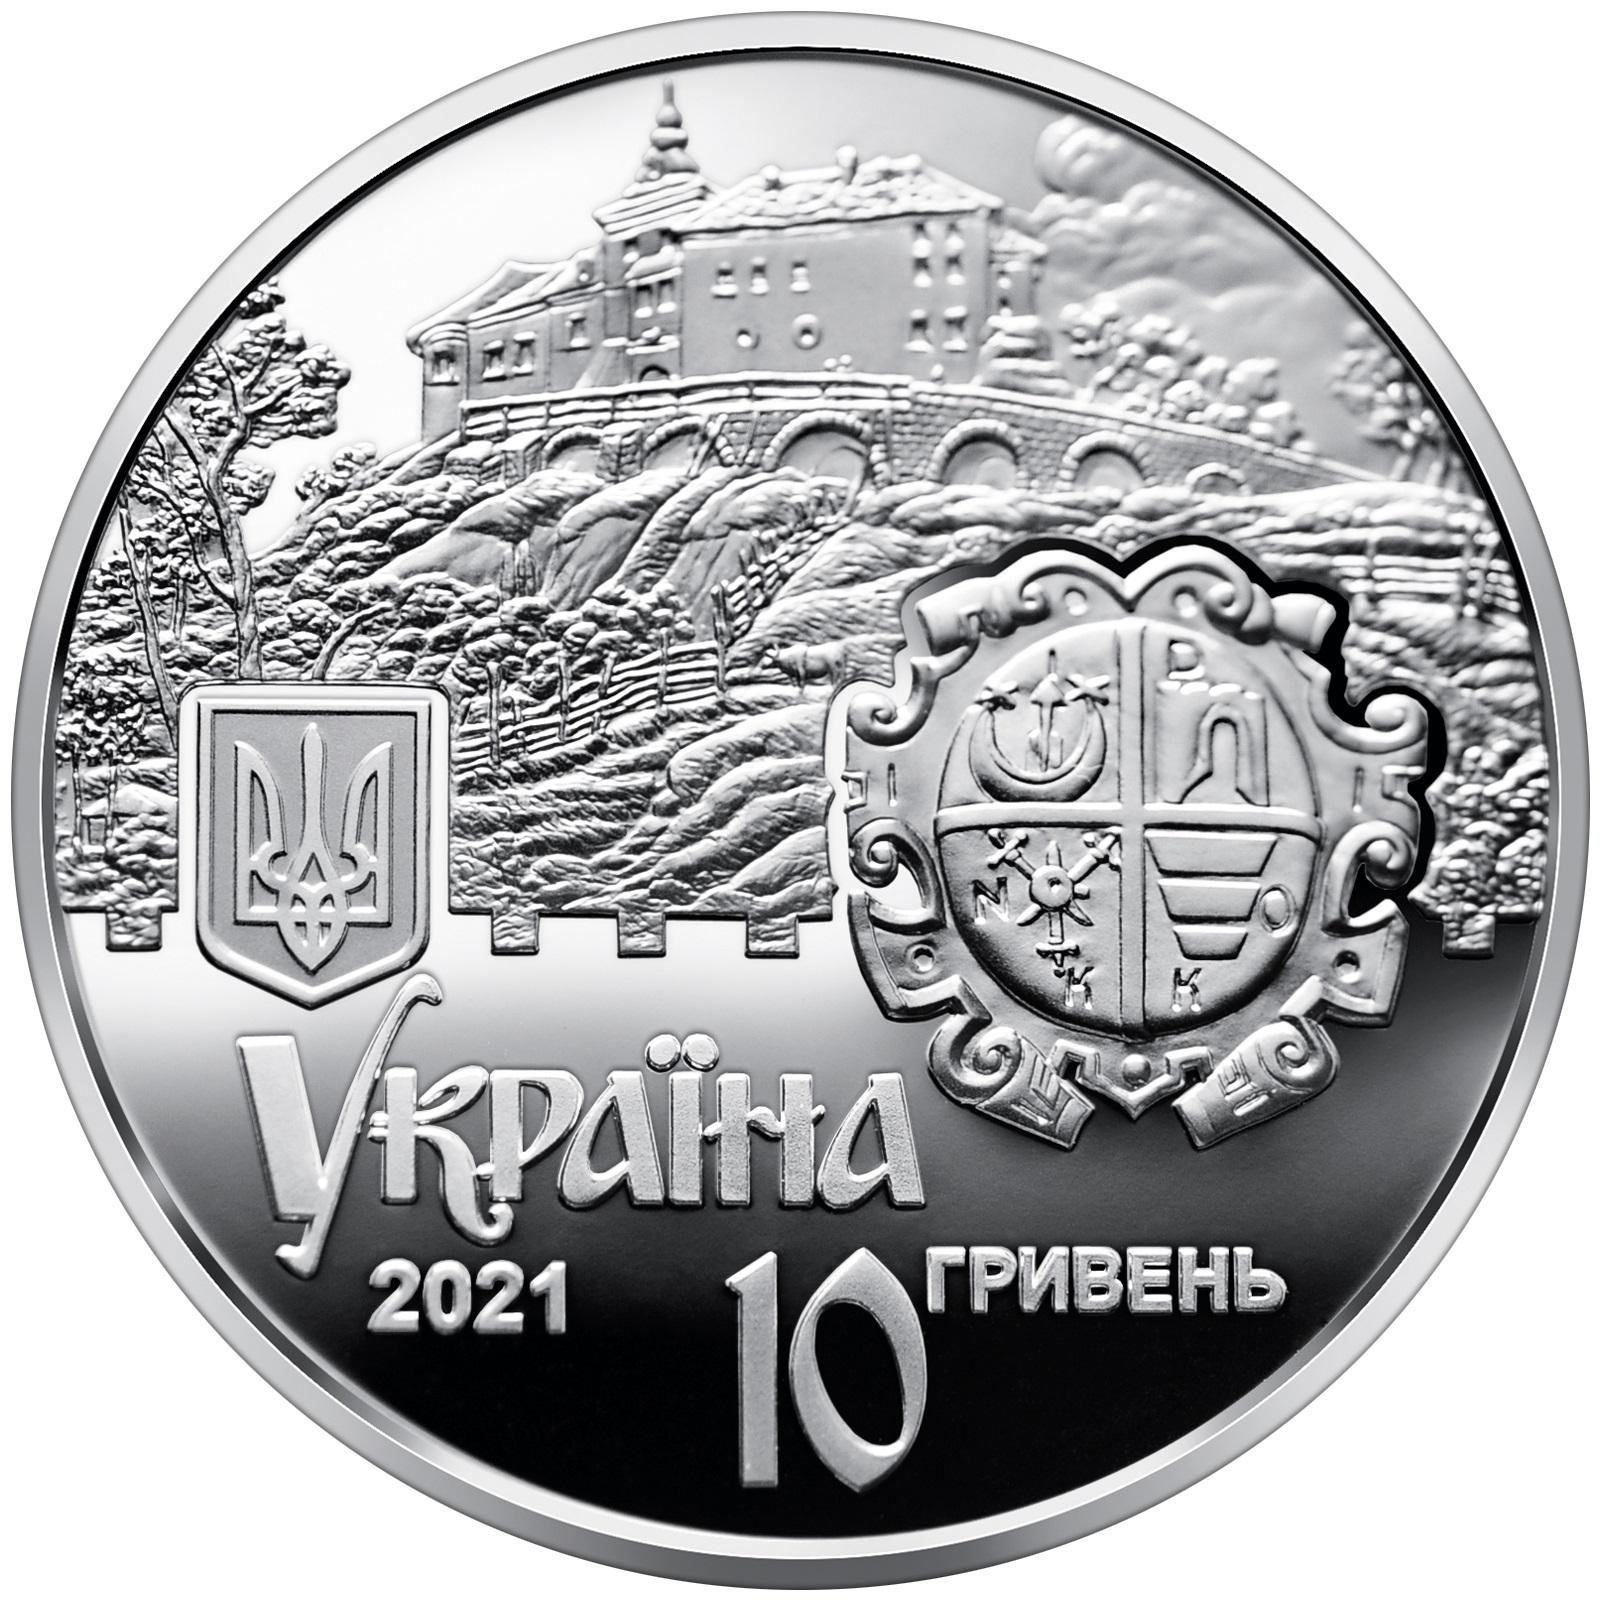 UA 10 Hryvnias 2021 National Bank of Ukraine logo